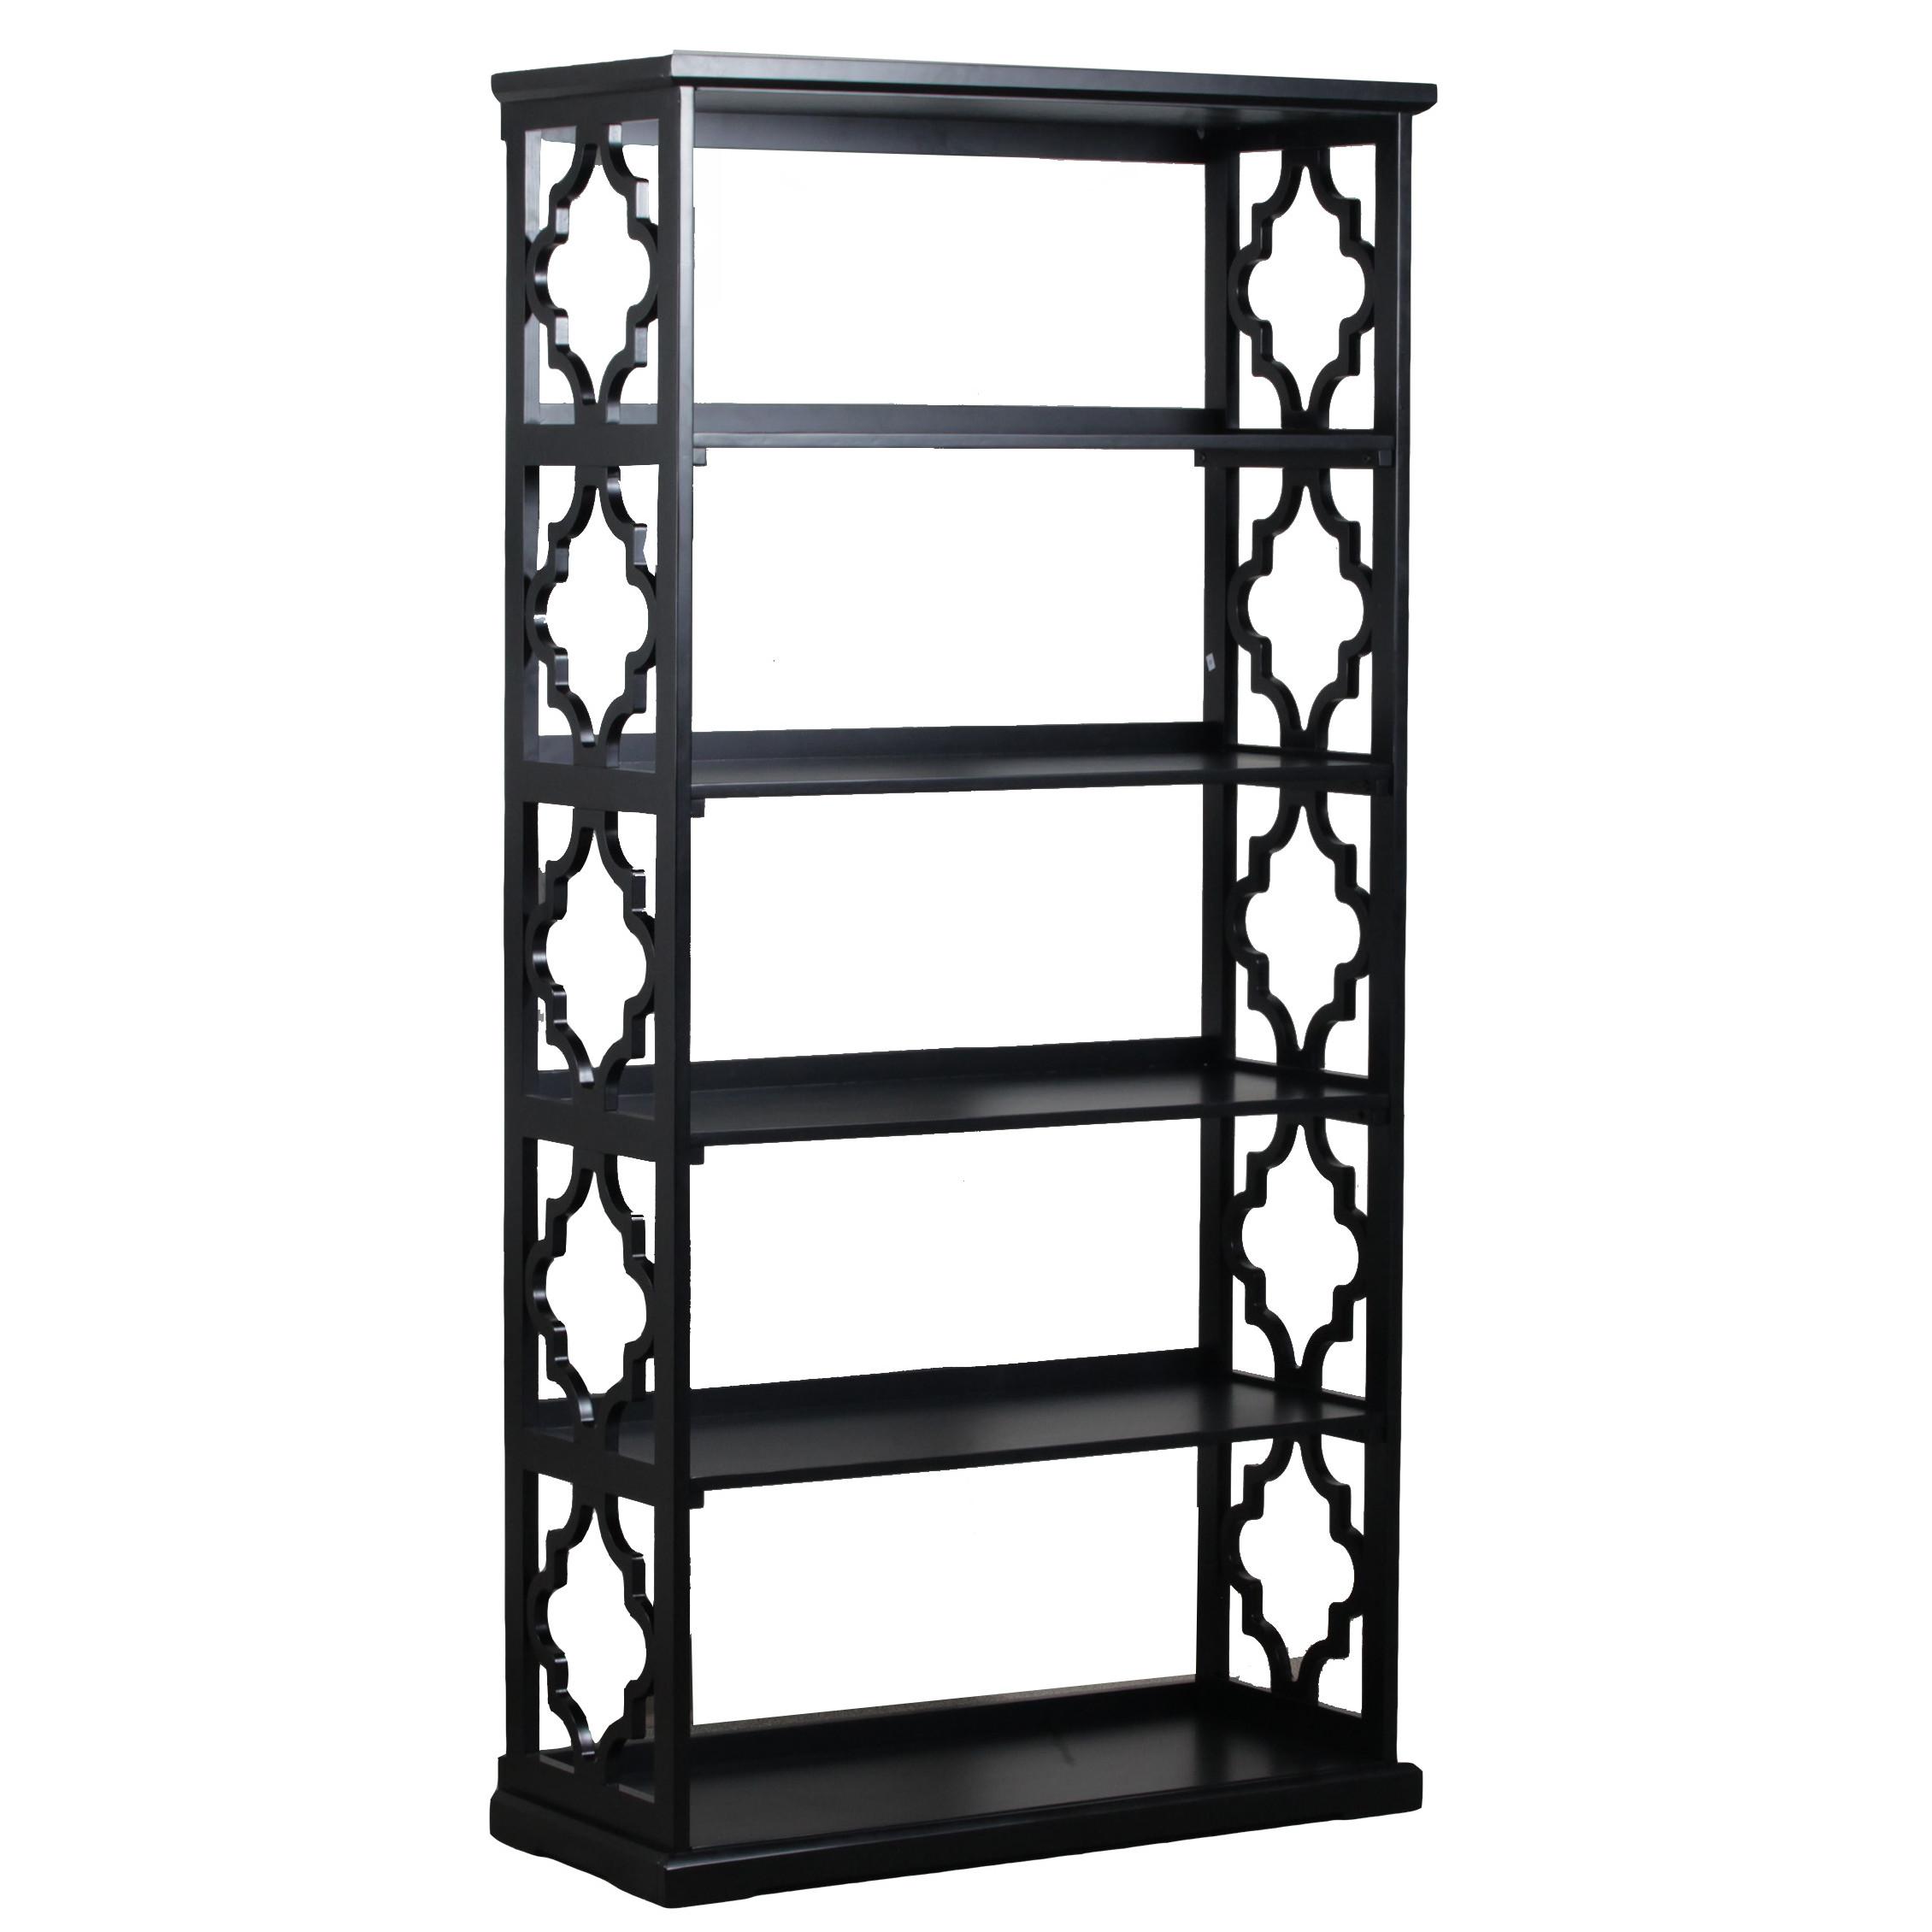 Kmart Bookshelves | Kmart Suitcases | Cabinet Storage